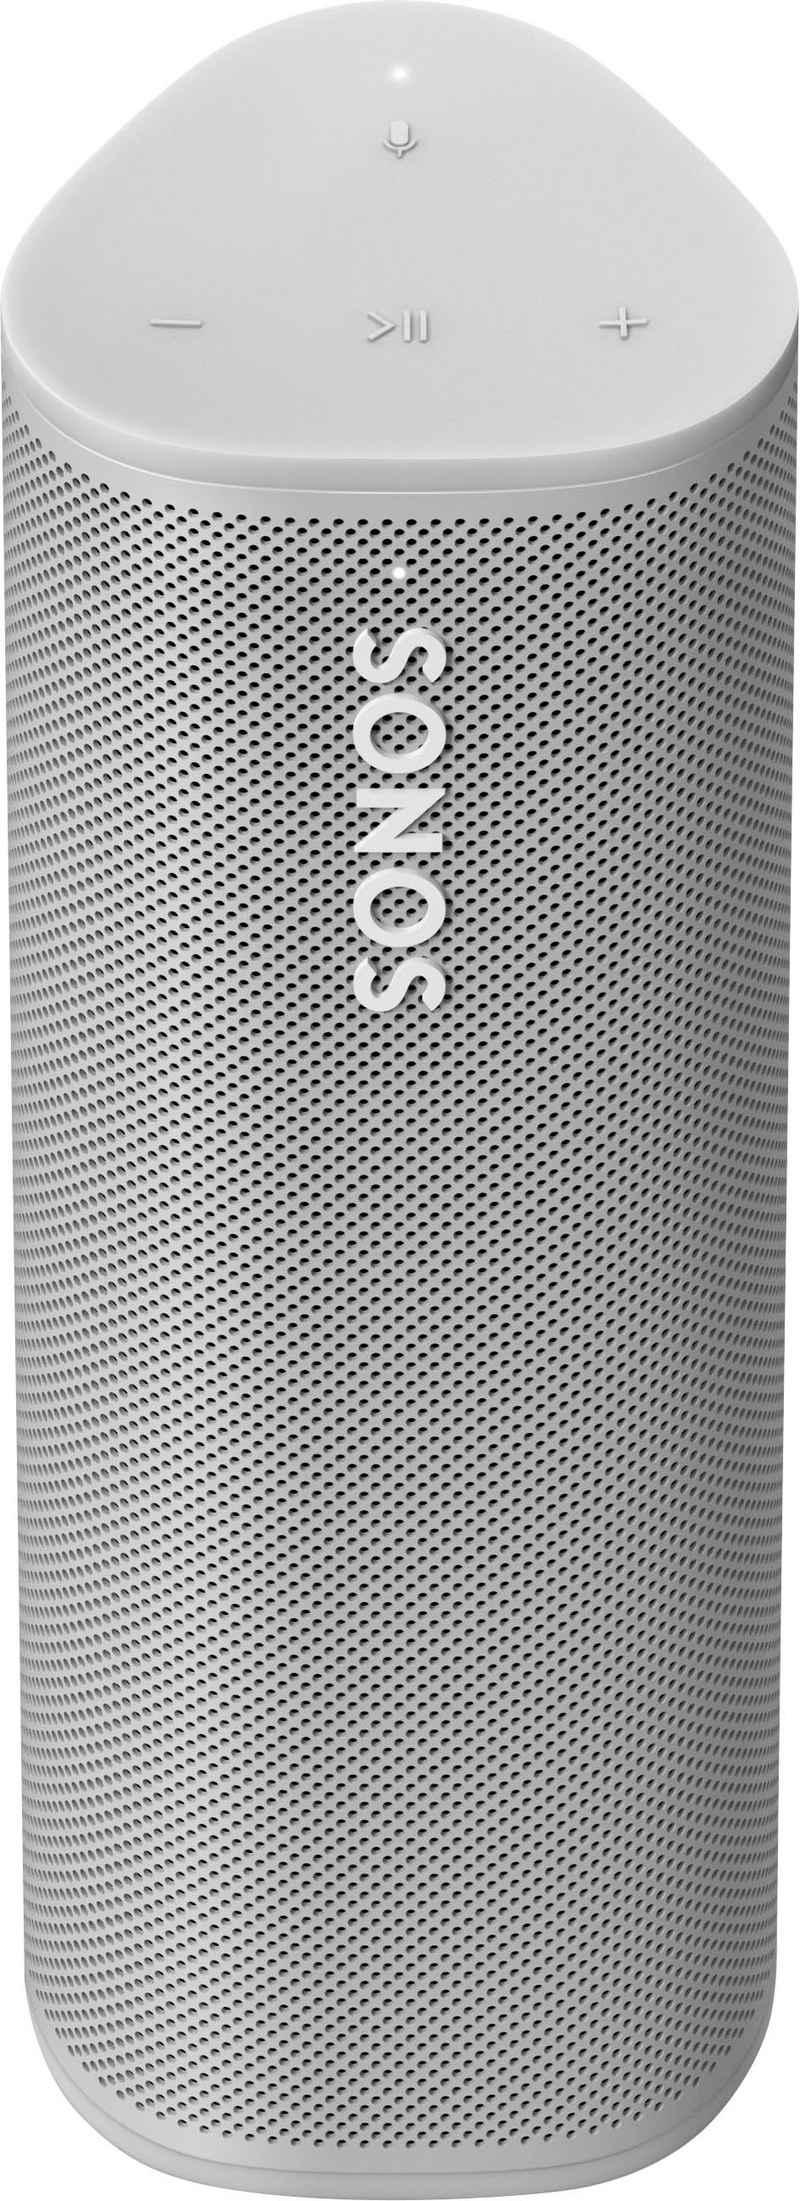 Sonos Roam Bluetooth-Lautsprecher (WLAN, Bluetooth)